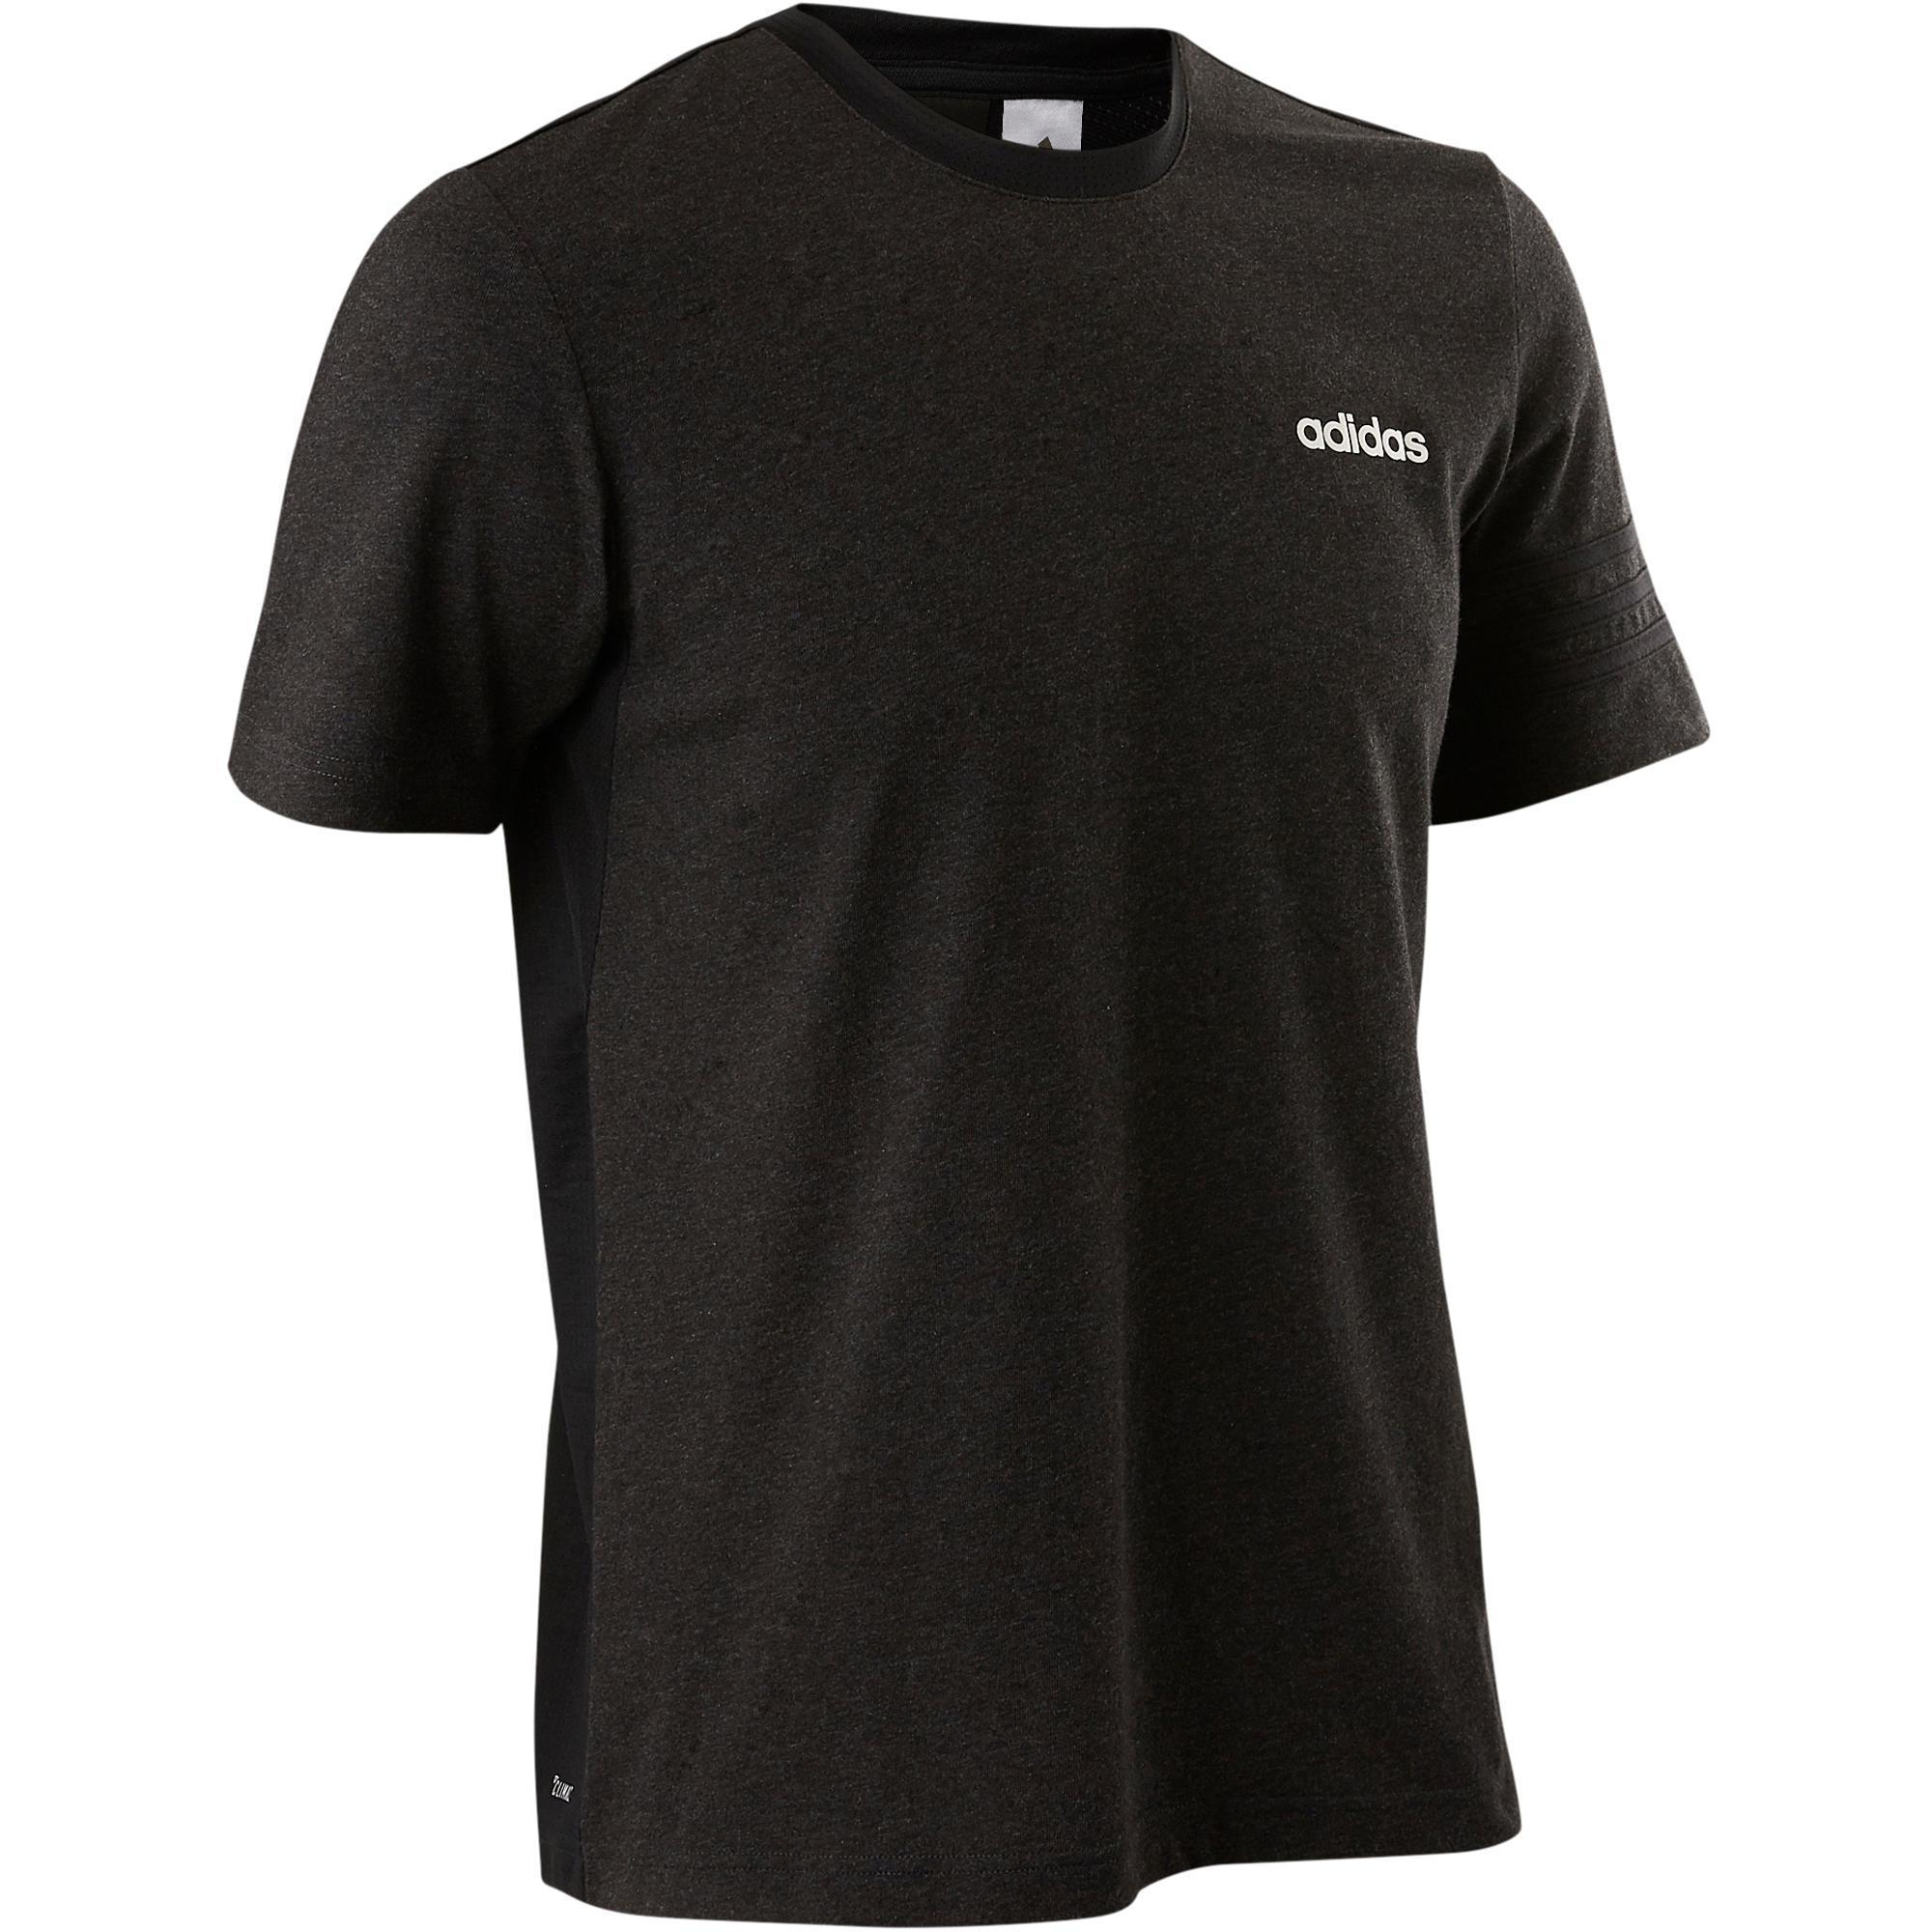 Adidas T-shirt Adidas Douario 500 pilates lichte gym zwart heren